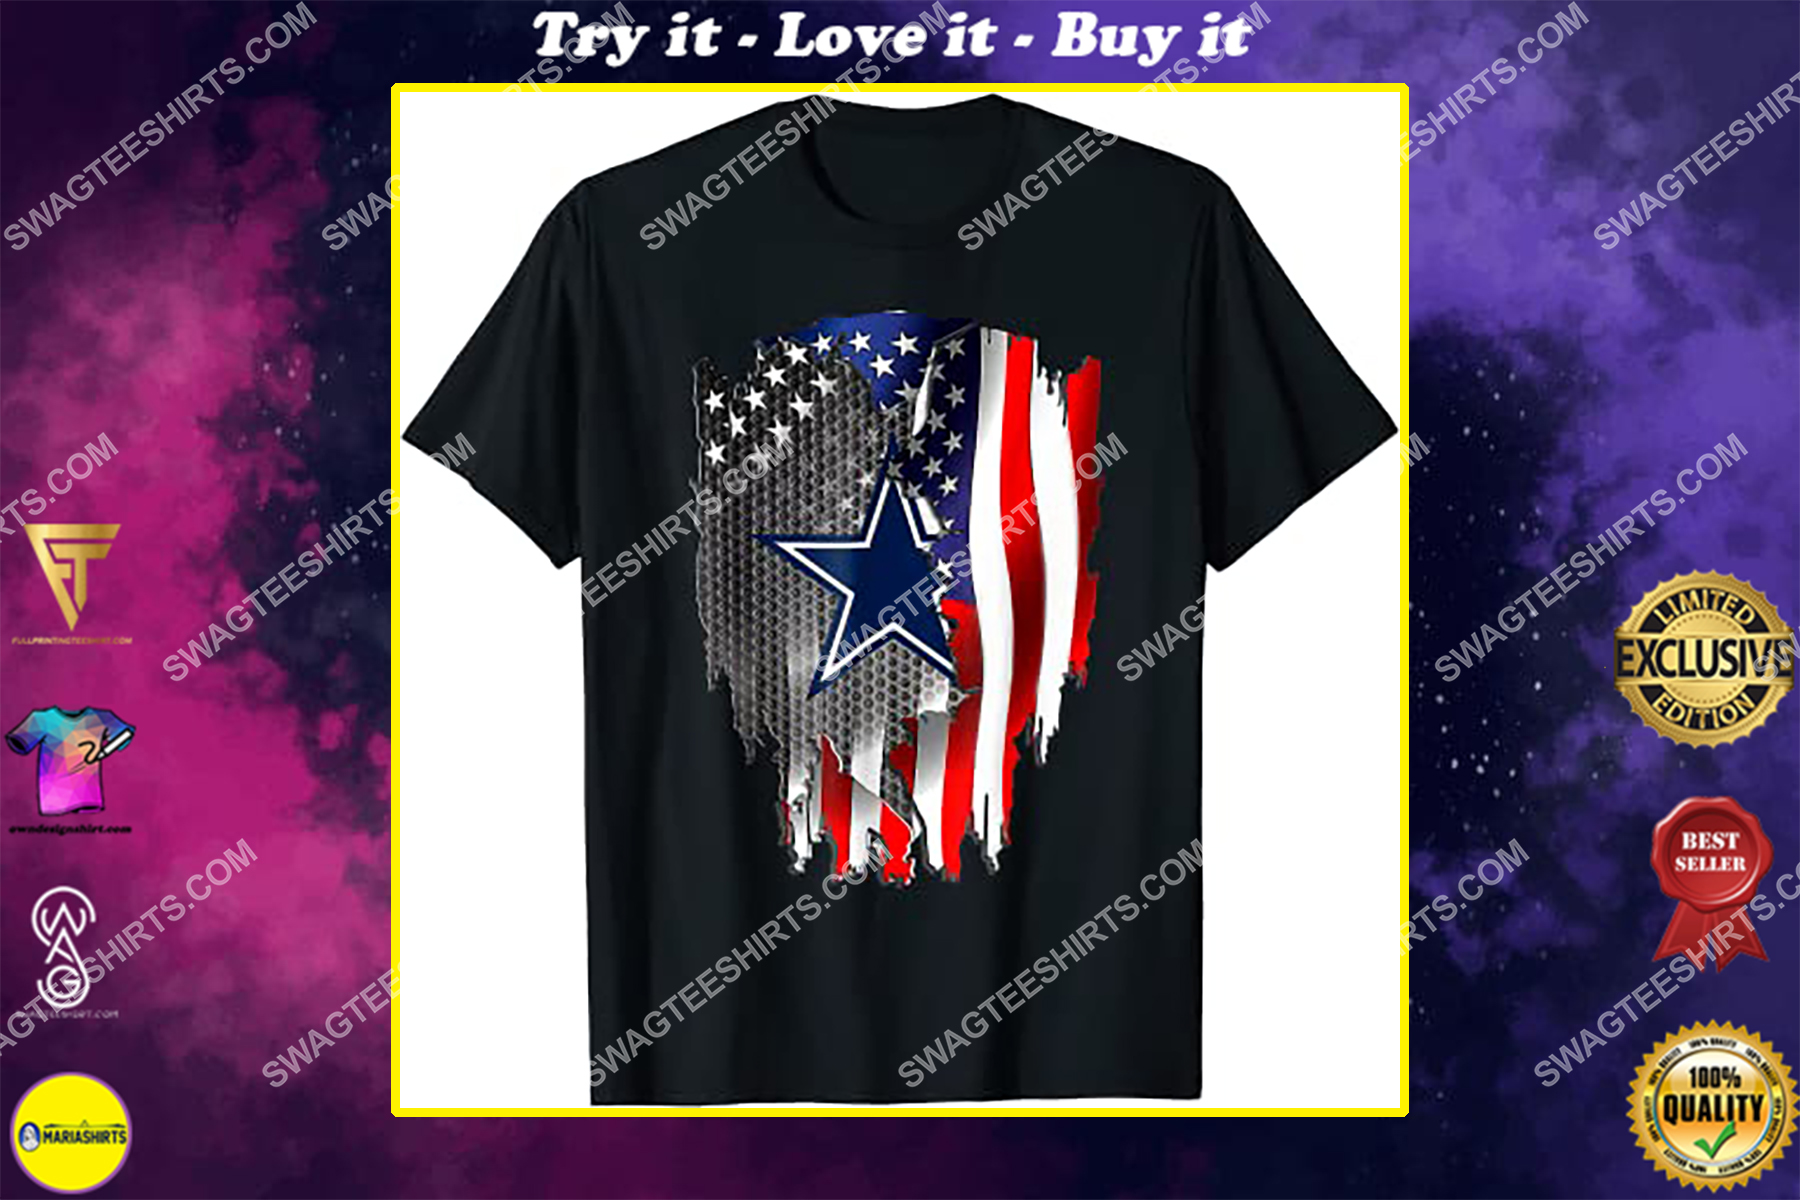 nfl dallas cowboys and american flag shirt